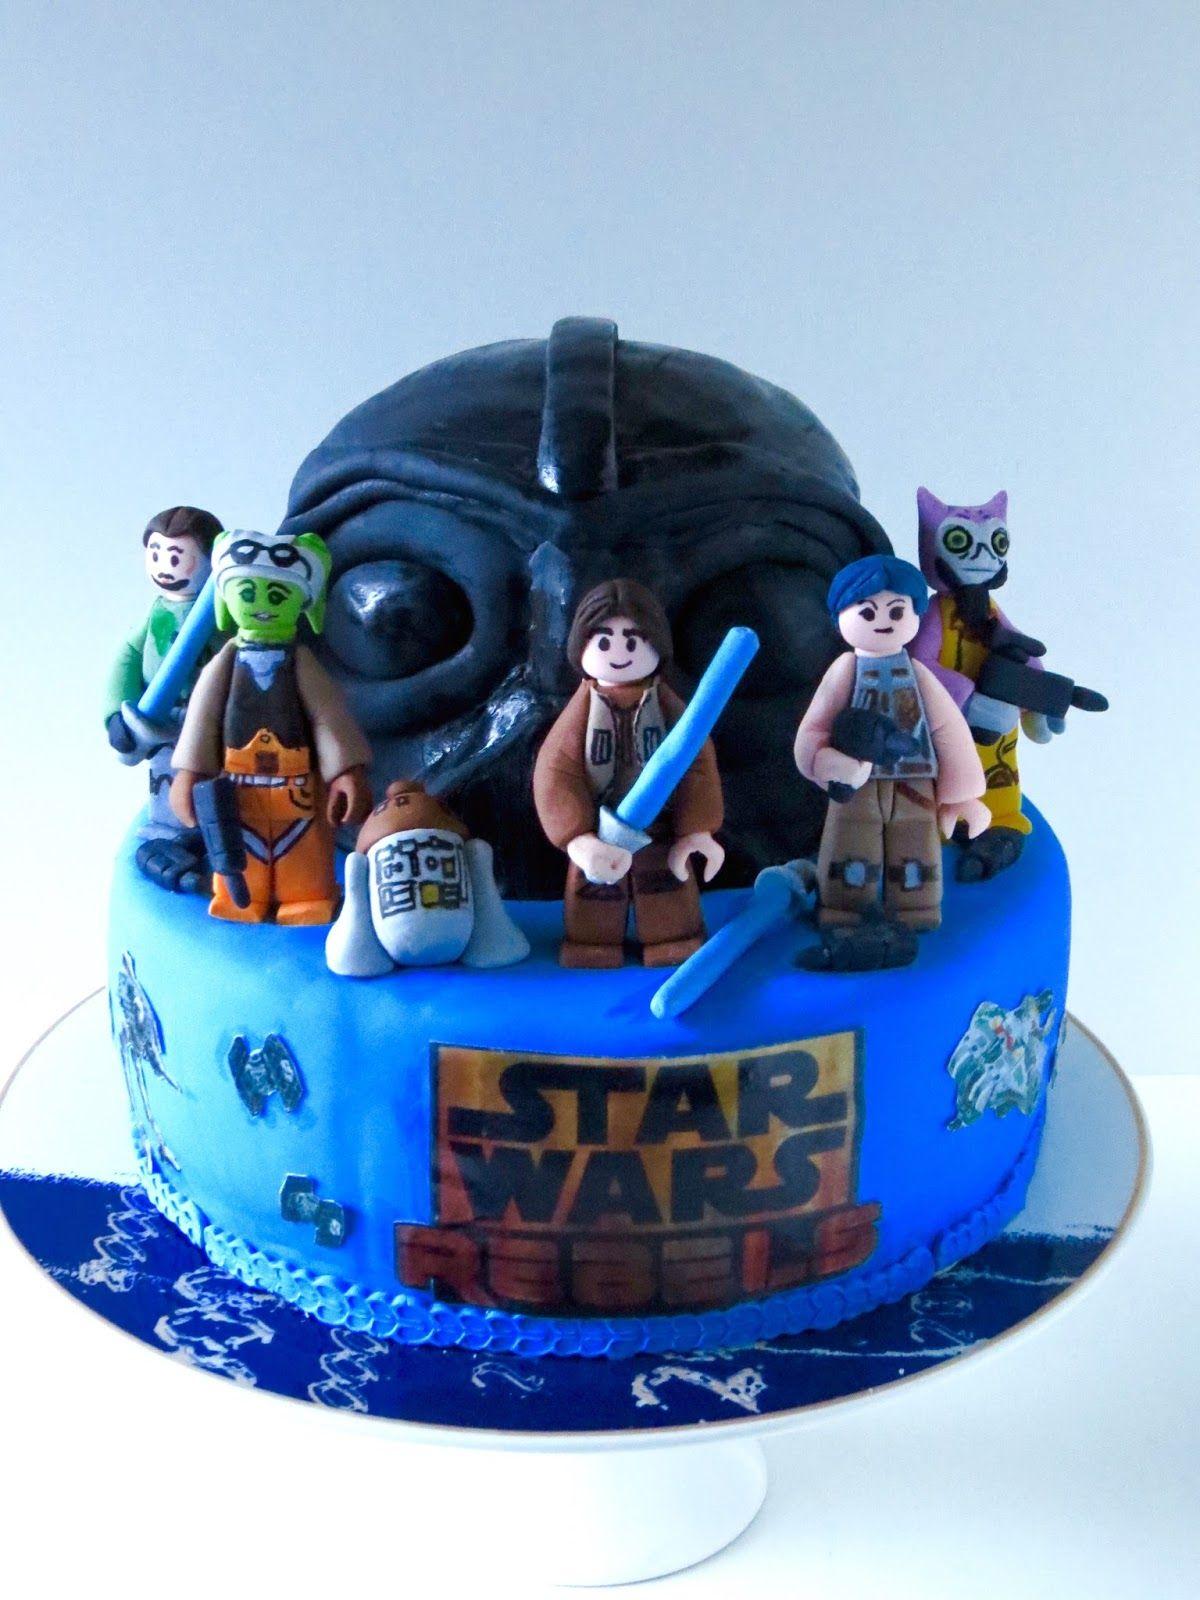 LEGO Star Wars Rebels Cake